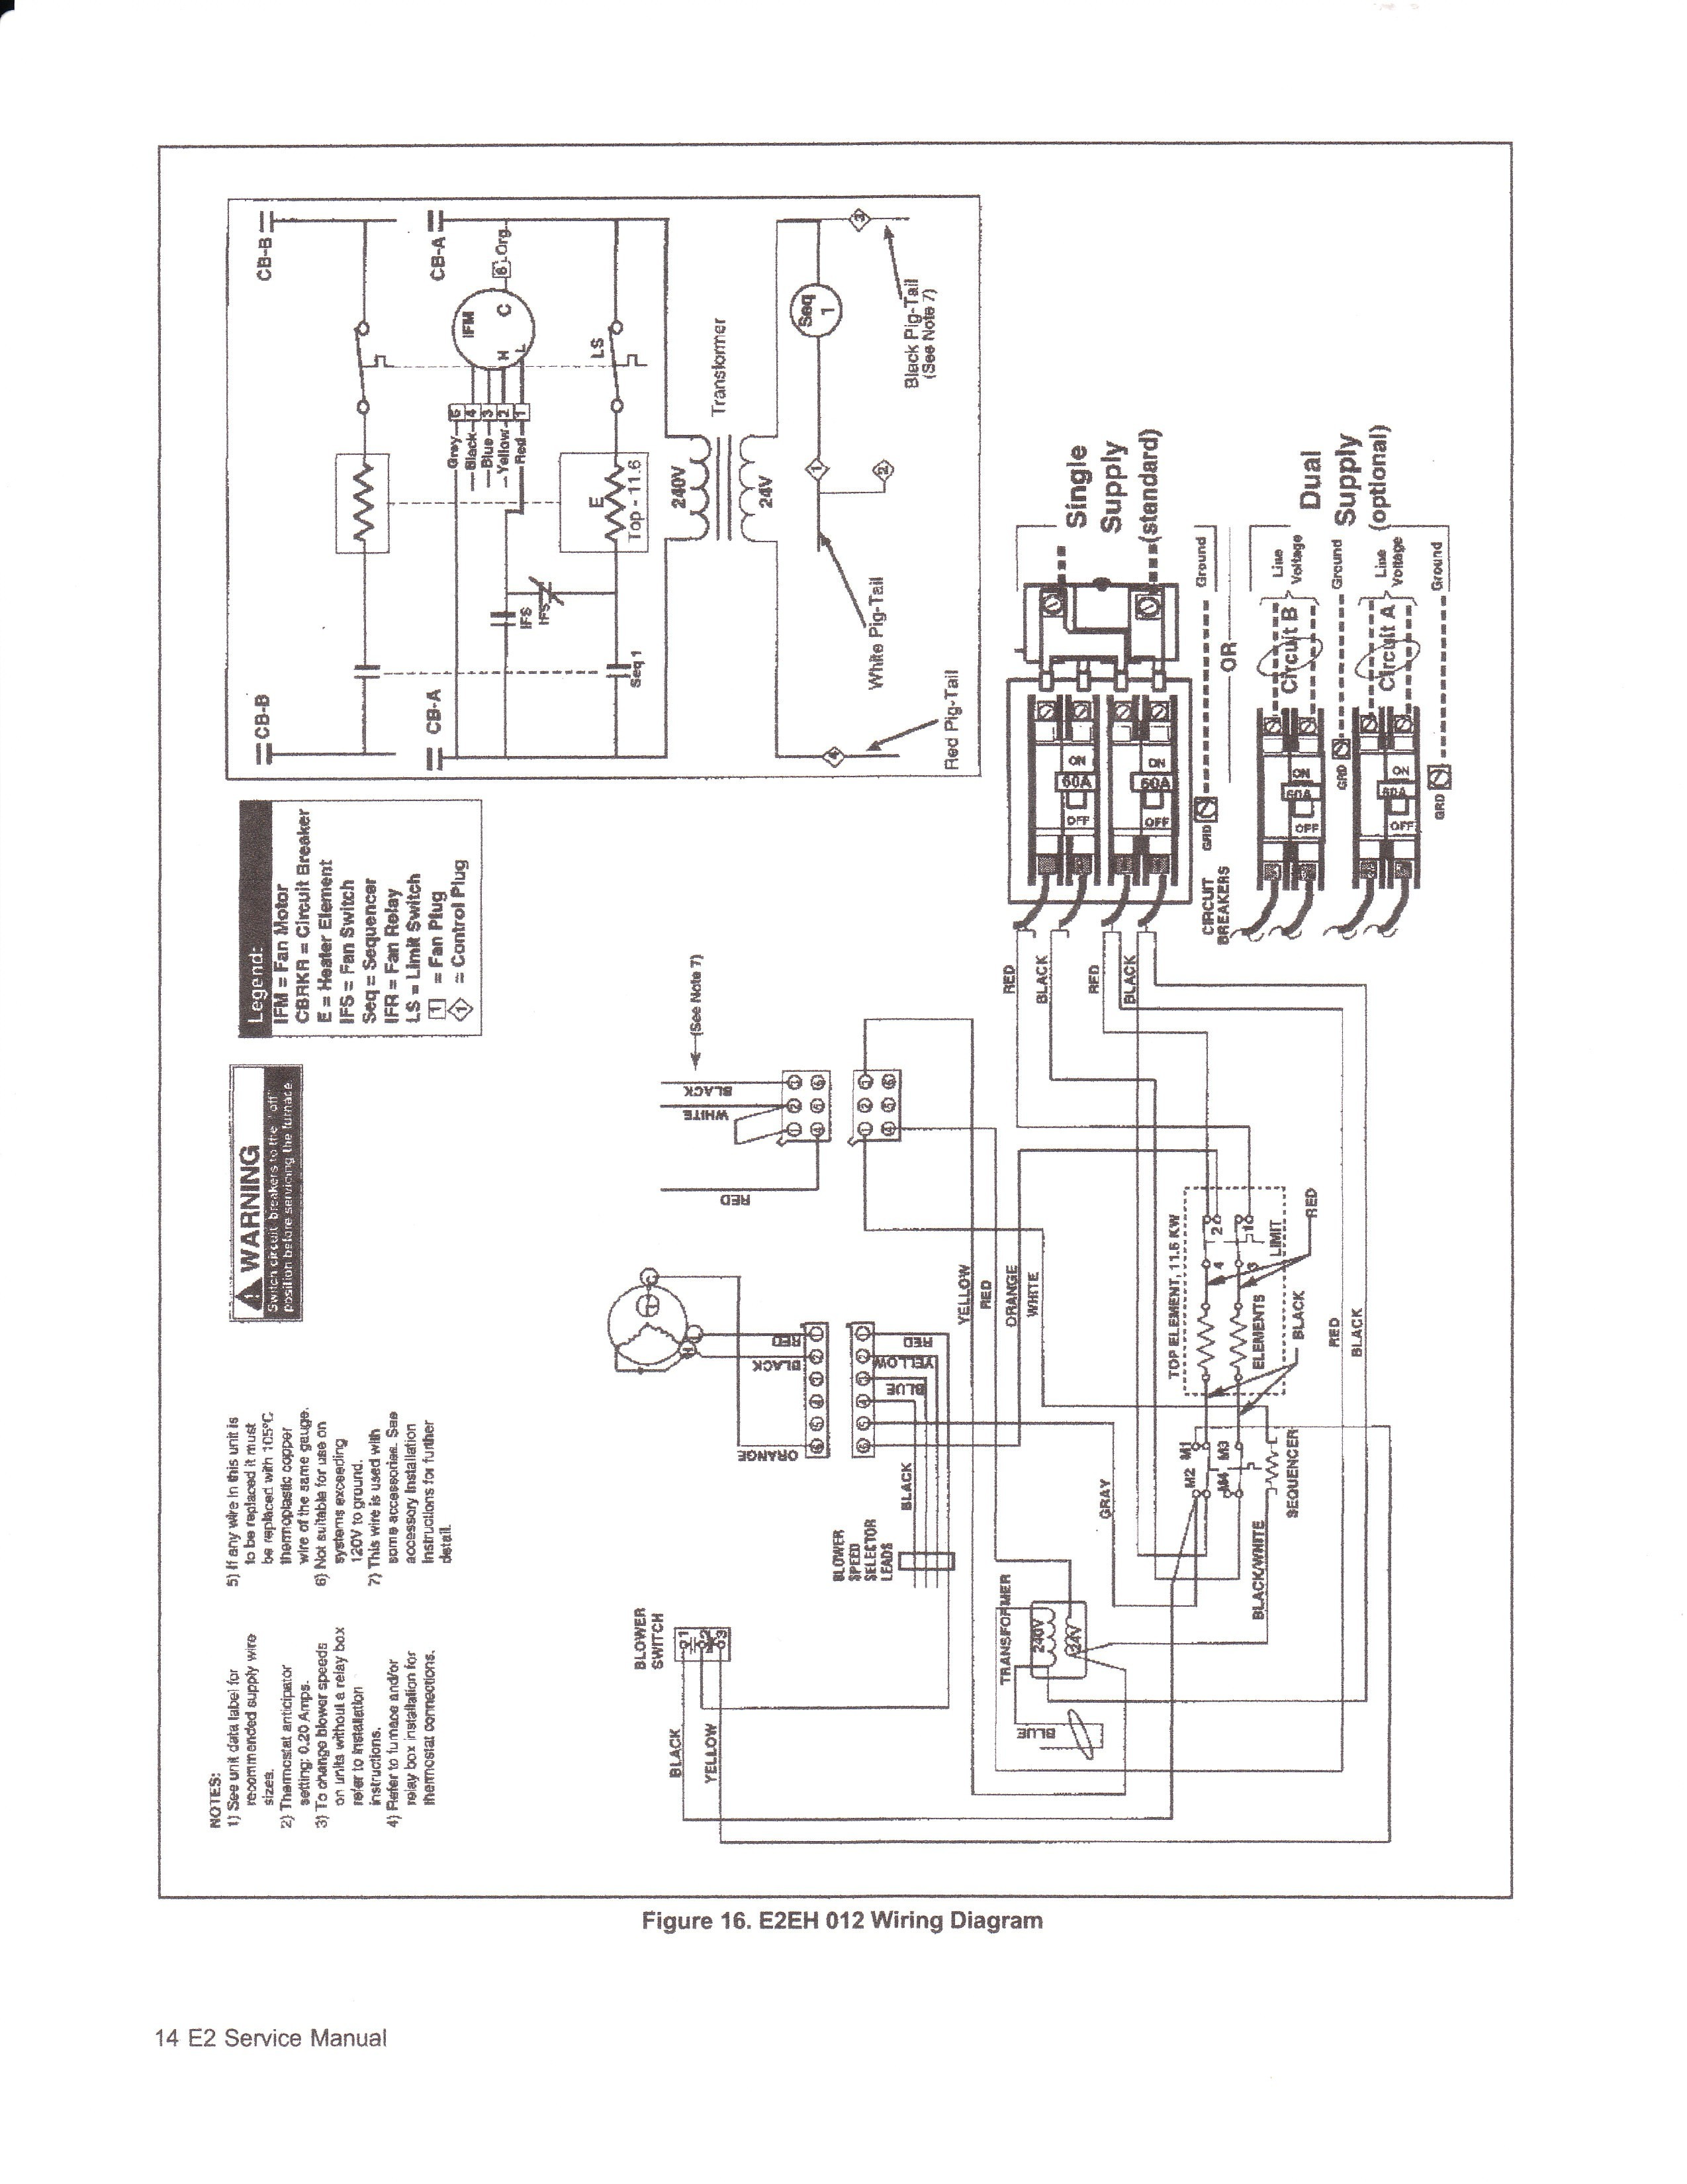 ... nordyne e2eb 015ha wiring diagram best of wiring diagram image Nordyne  Electric Furnace Wiring Diagram intertherm